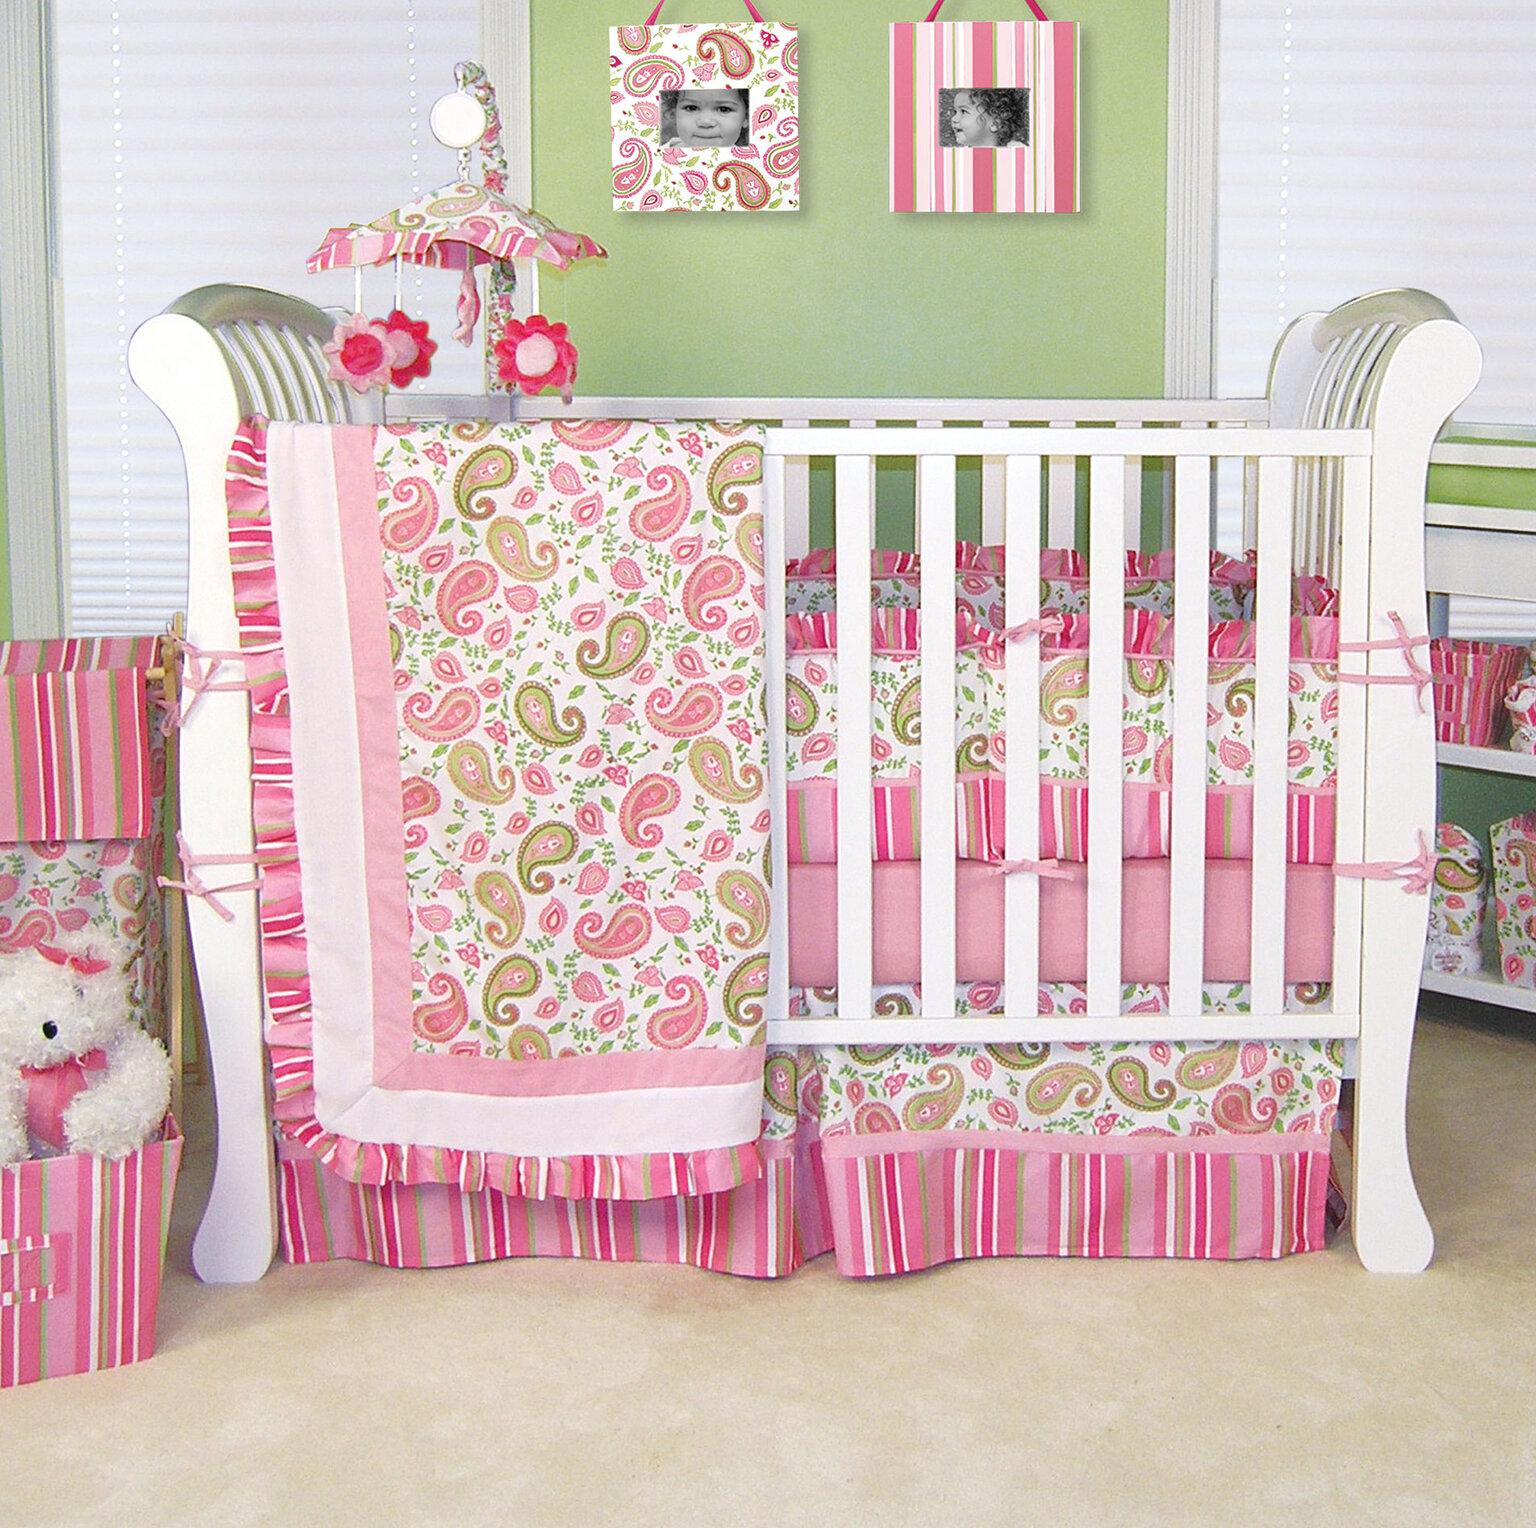 2b4f72e76246 Harriet Bee Tomko Paisley 4 Piece Crib Bedding Set   Reviews